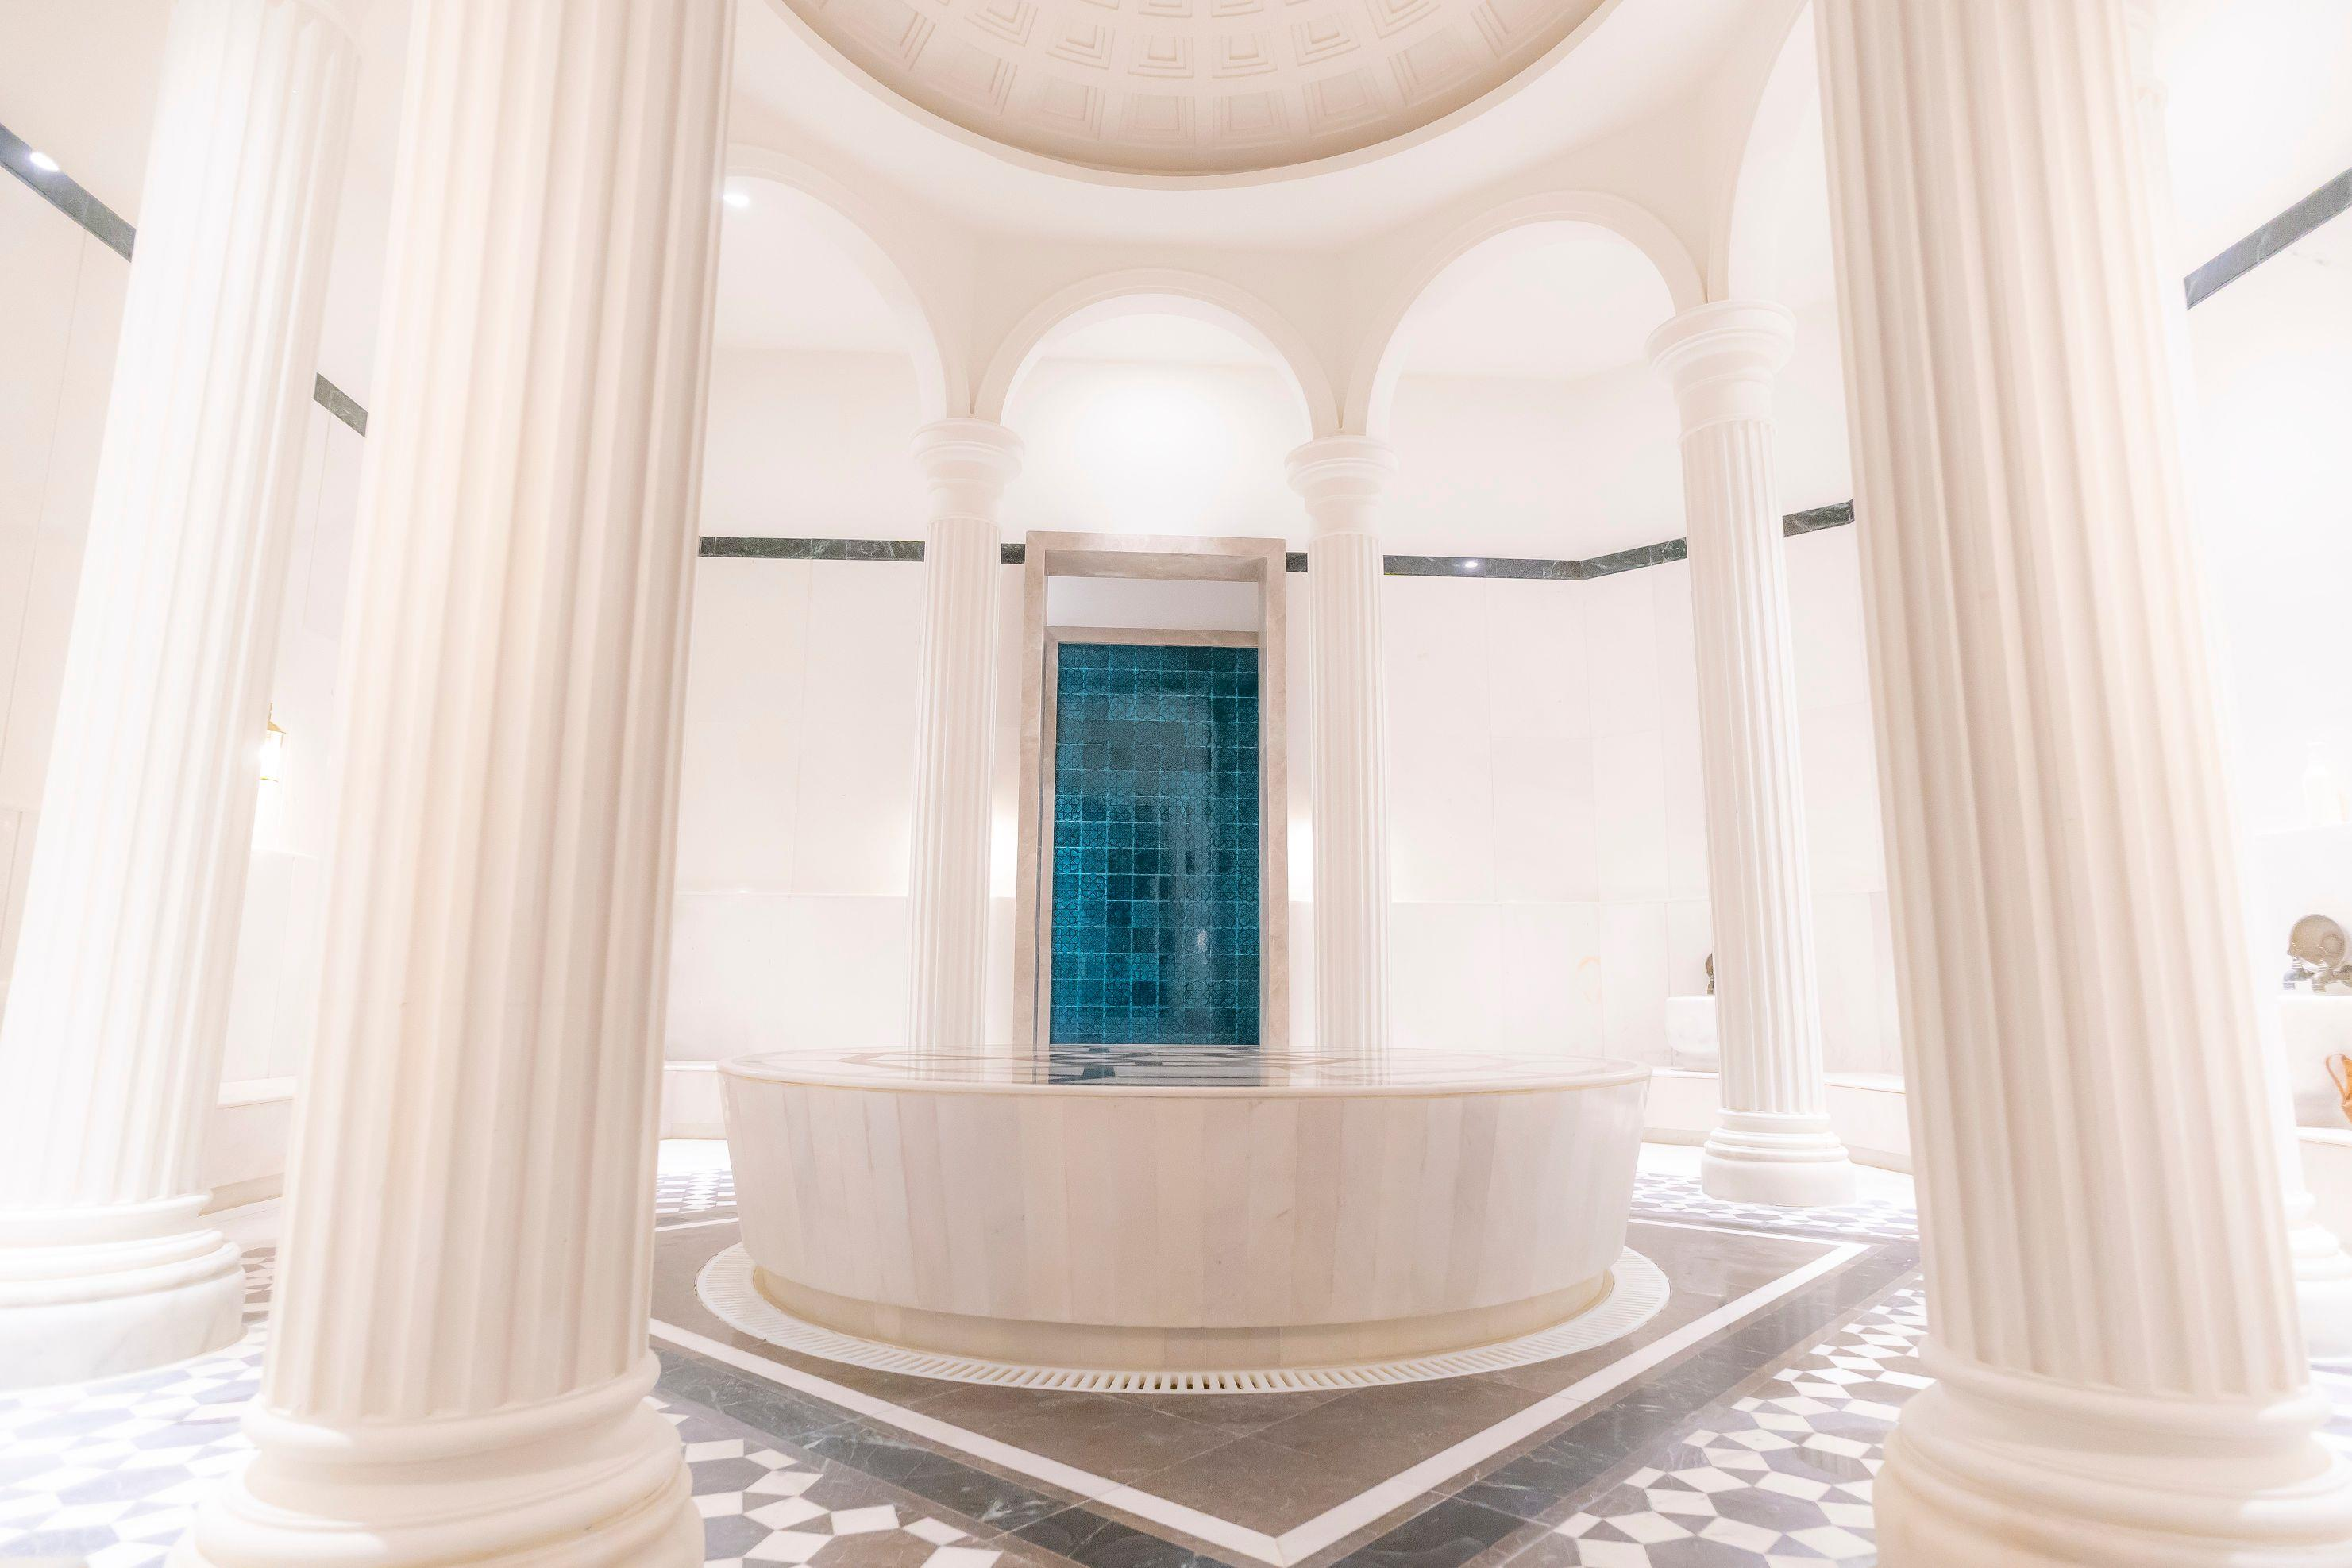 http://www.orextravel.sk/OREX/hotelphotos/the-land-of-legends-general-002.jpg